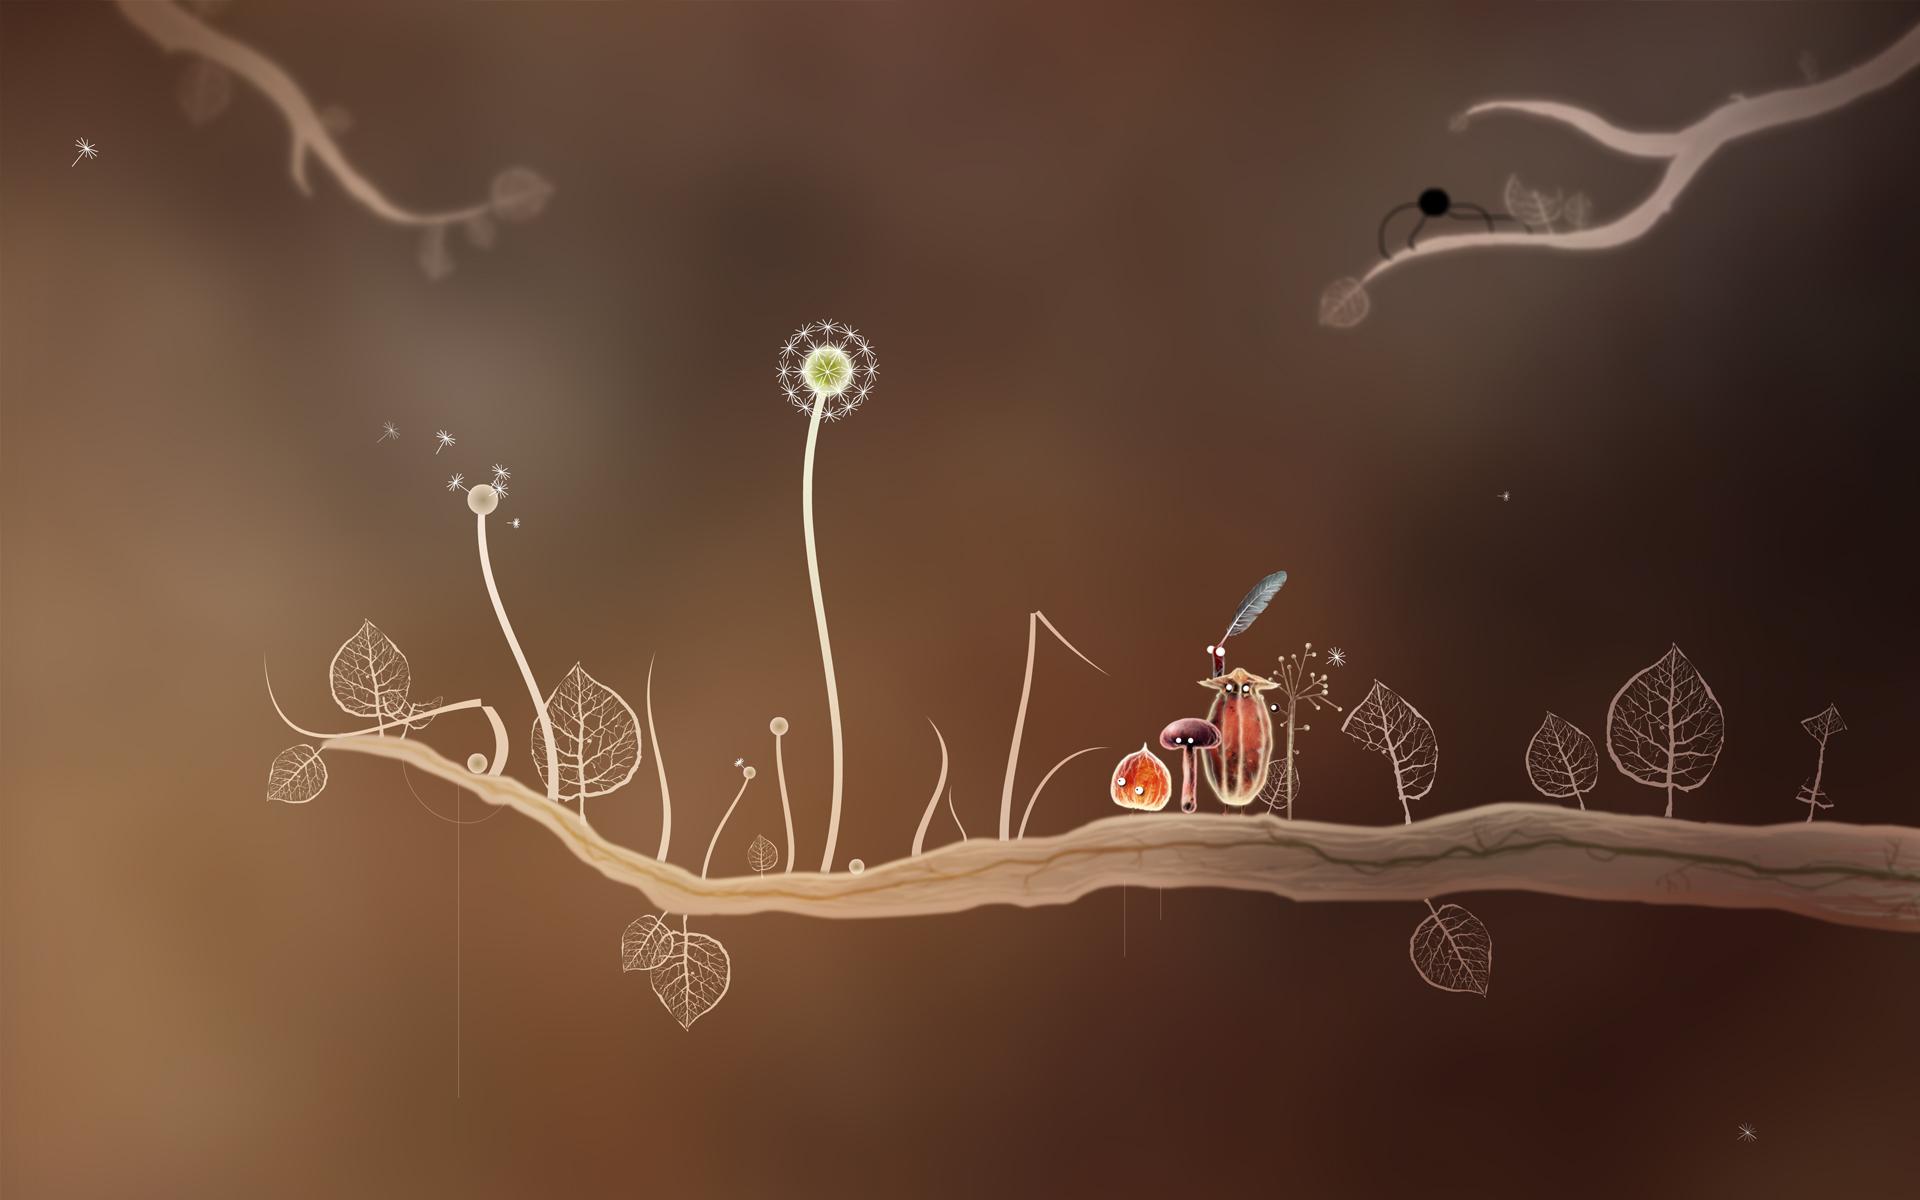 Botanicula Pics, Video Game Collection